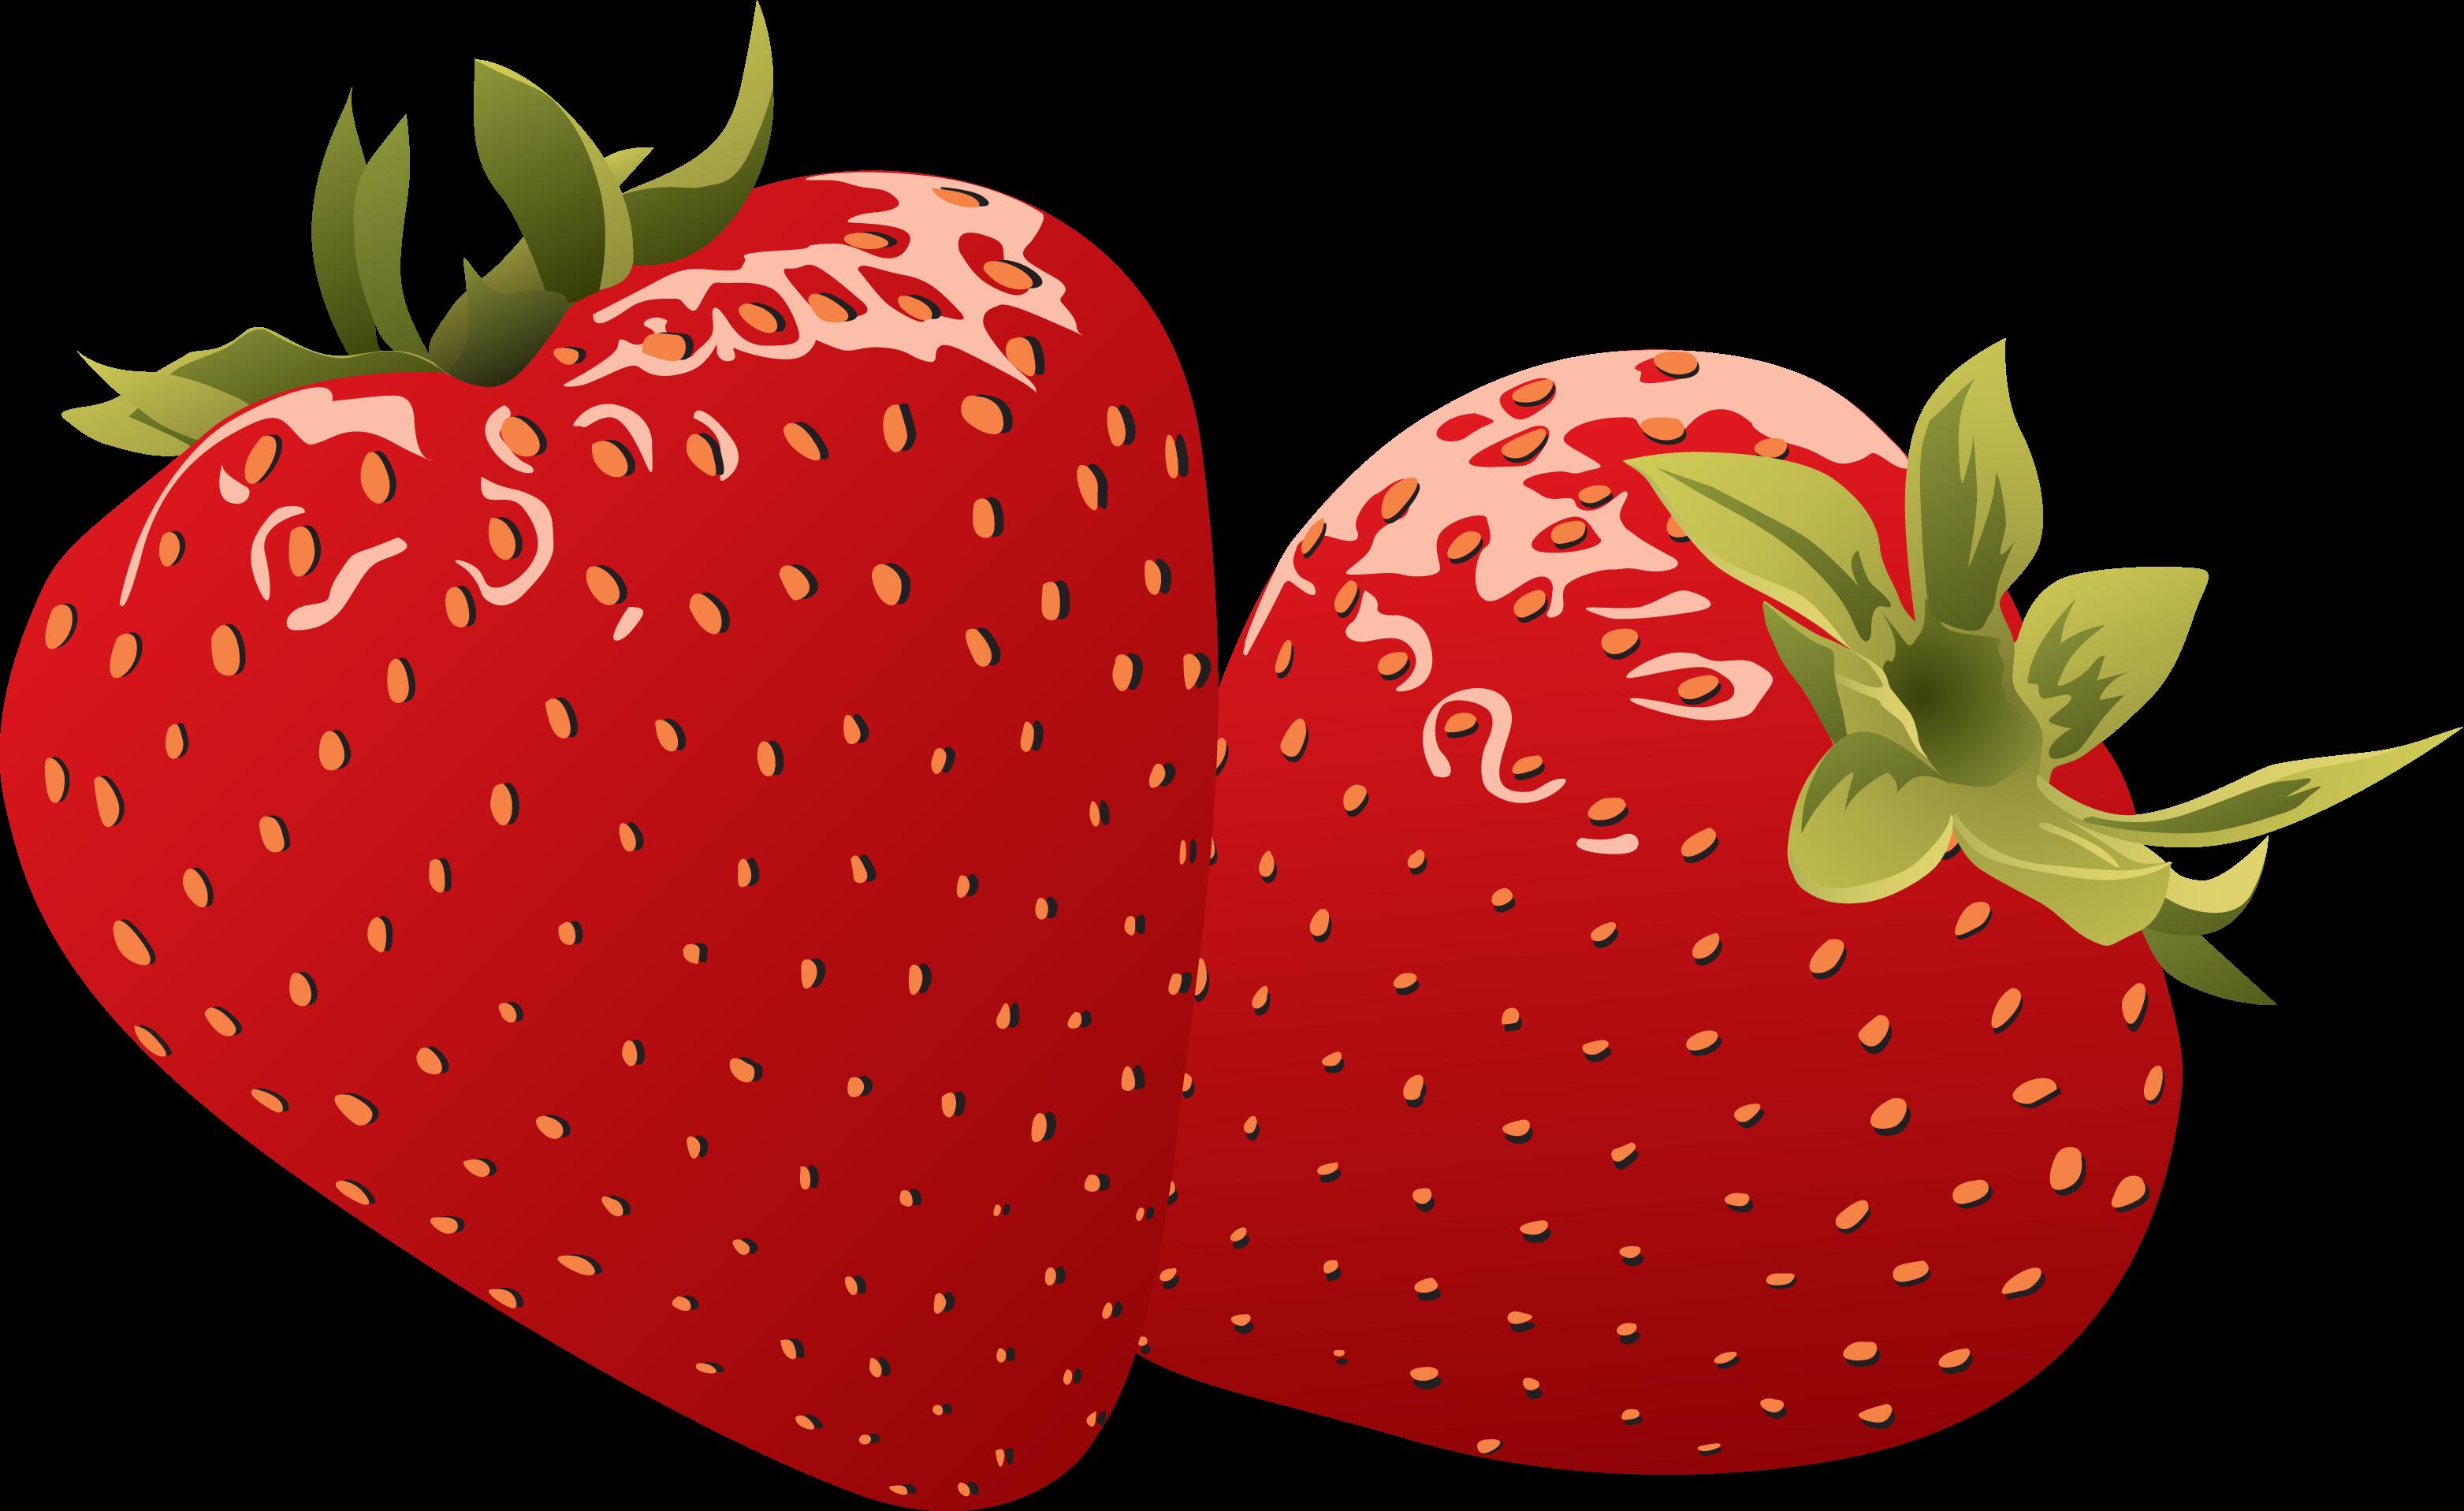 Strawberry group hd . Strawberries clipart strawbery